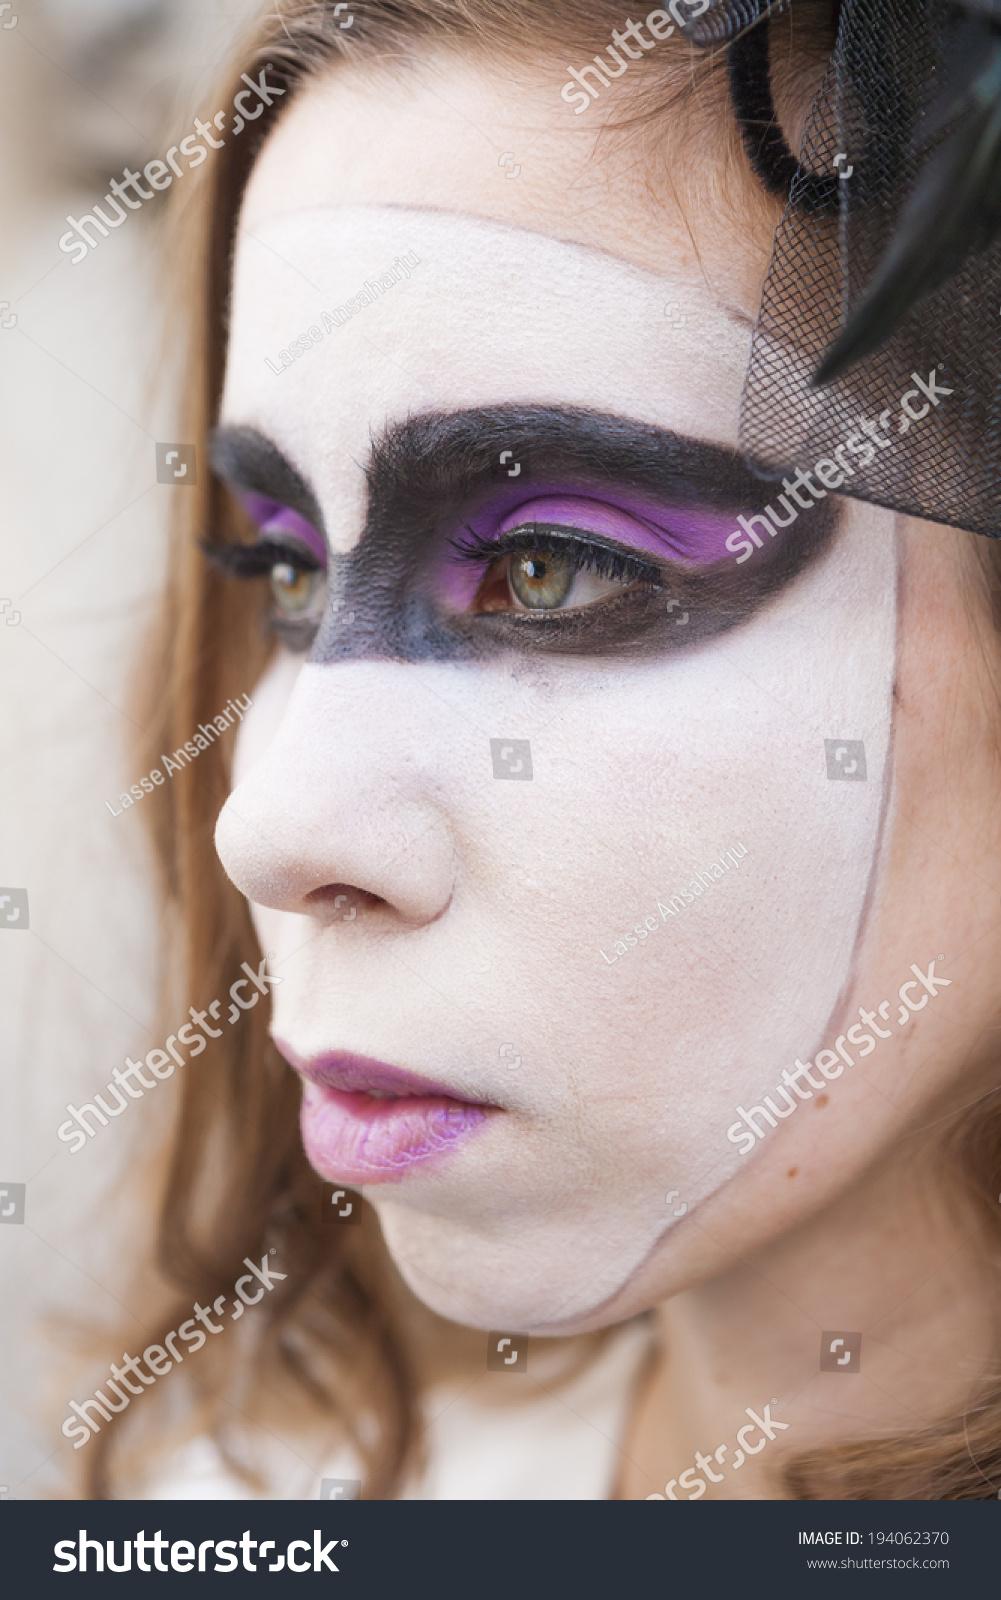 finnish model harlequin makeup stock photo 194062370 shutterstock. Black Bedroom Furniture Sets. Home Design Ideas